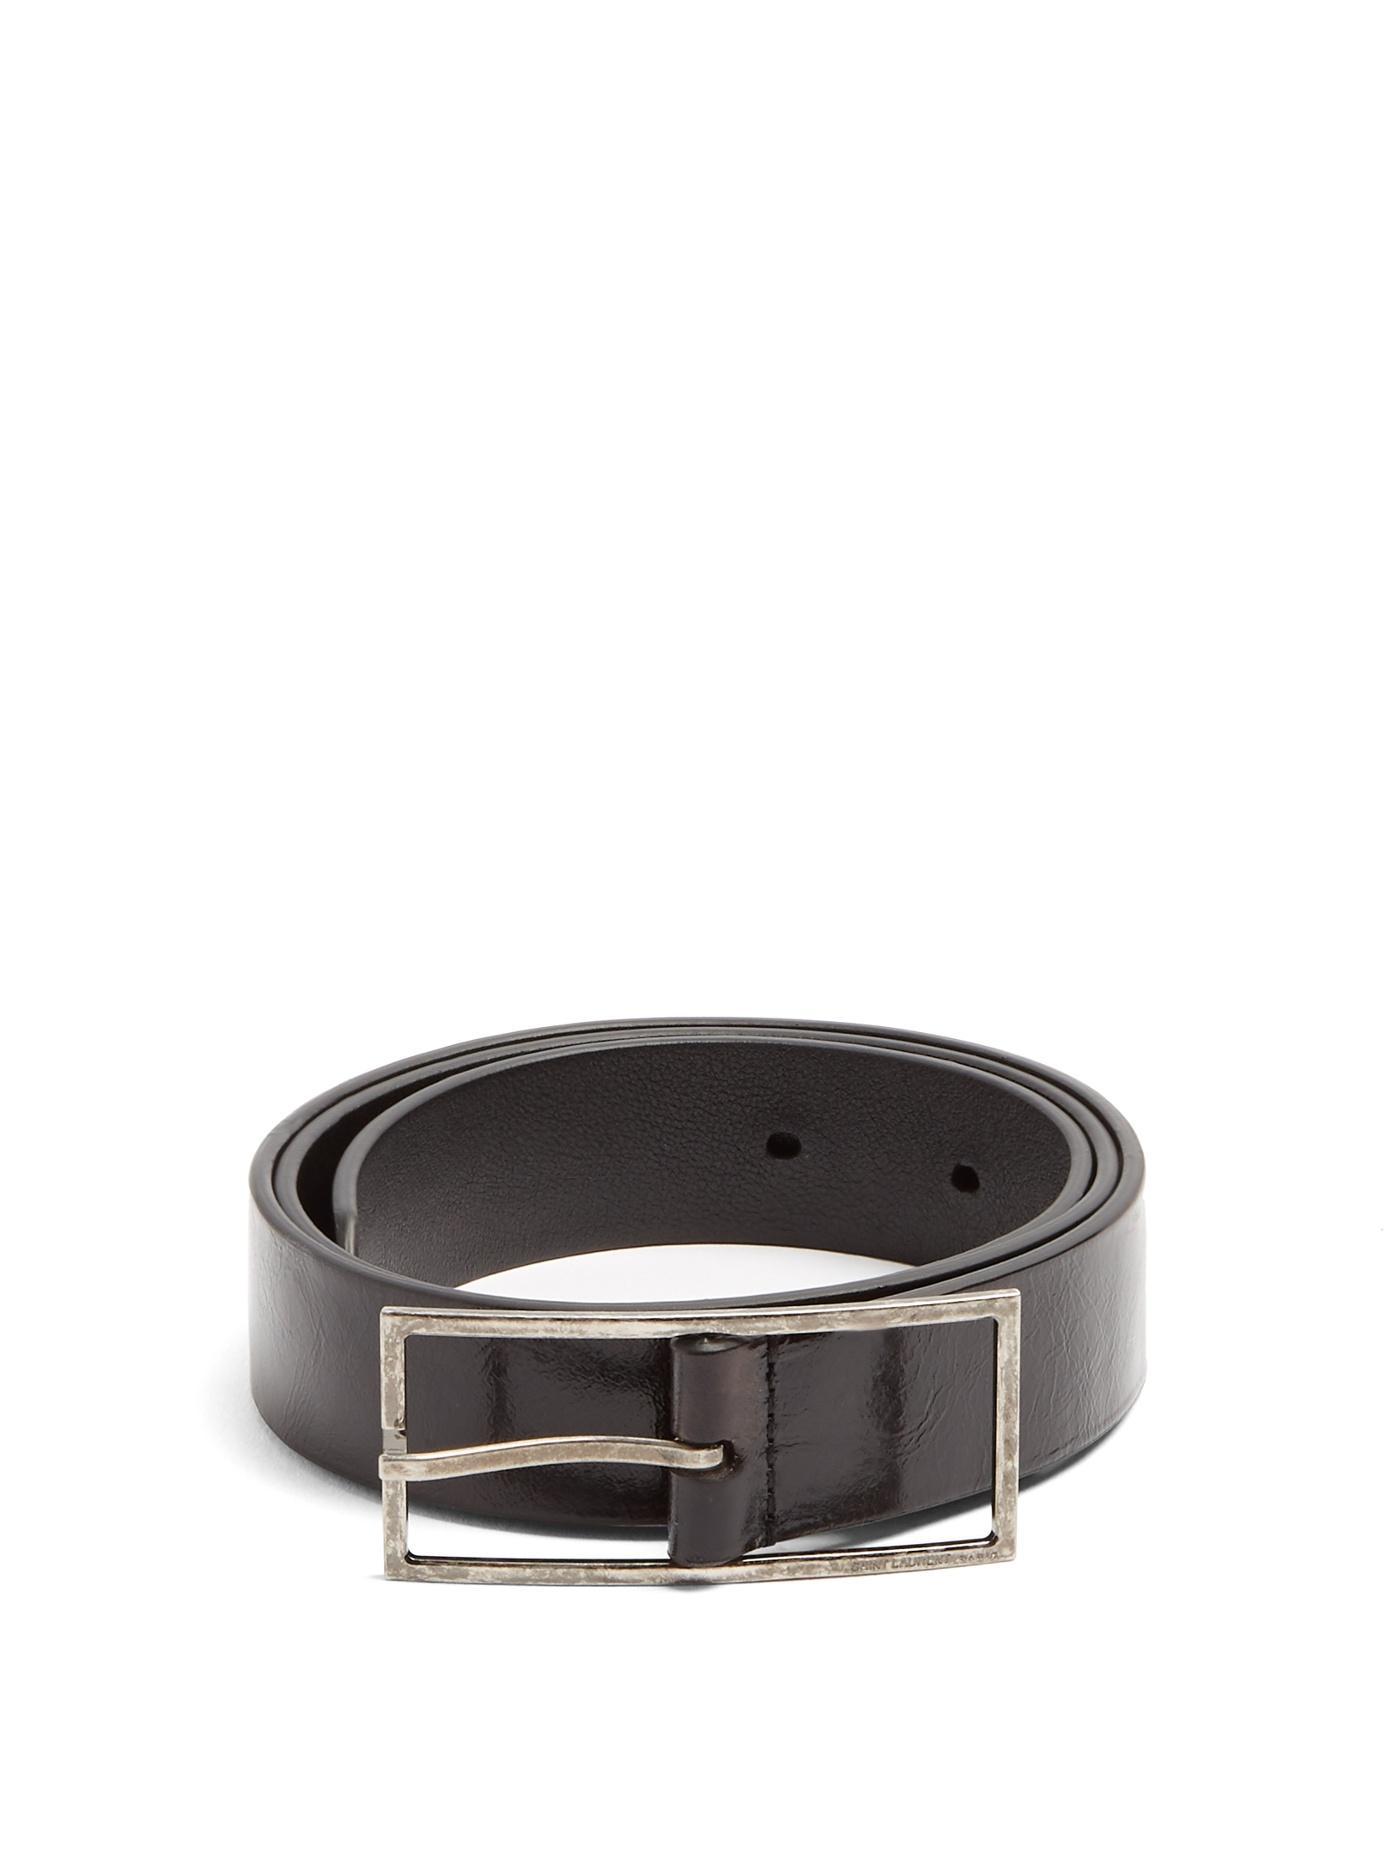 97581602ce Skinny Patent-Leather Belt in Black